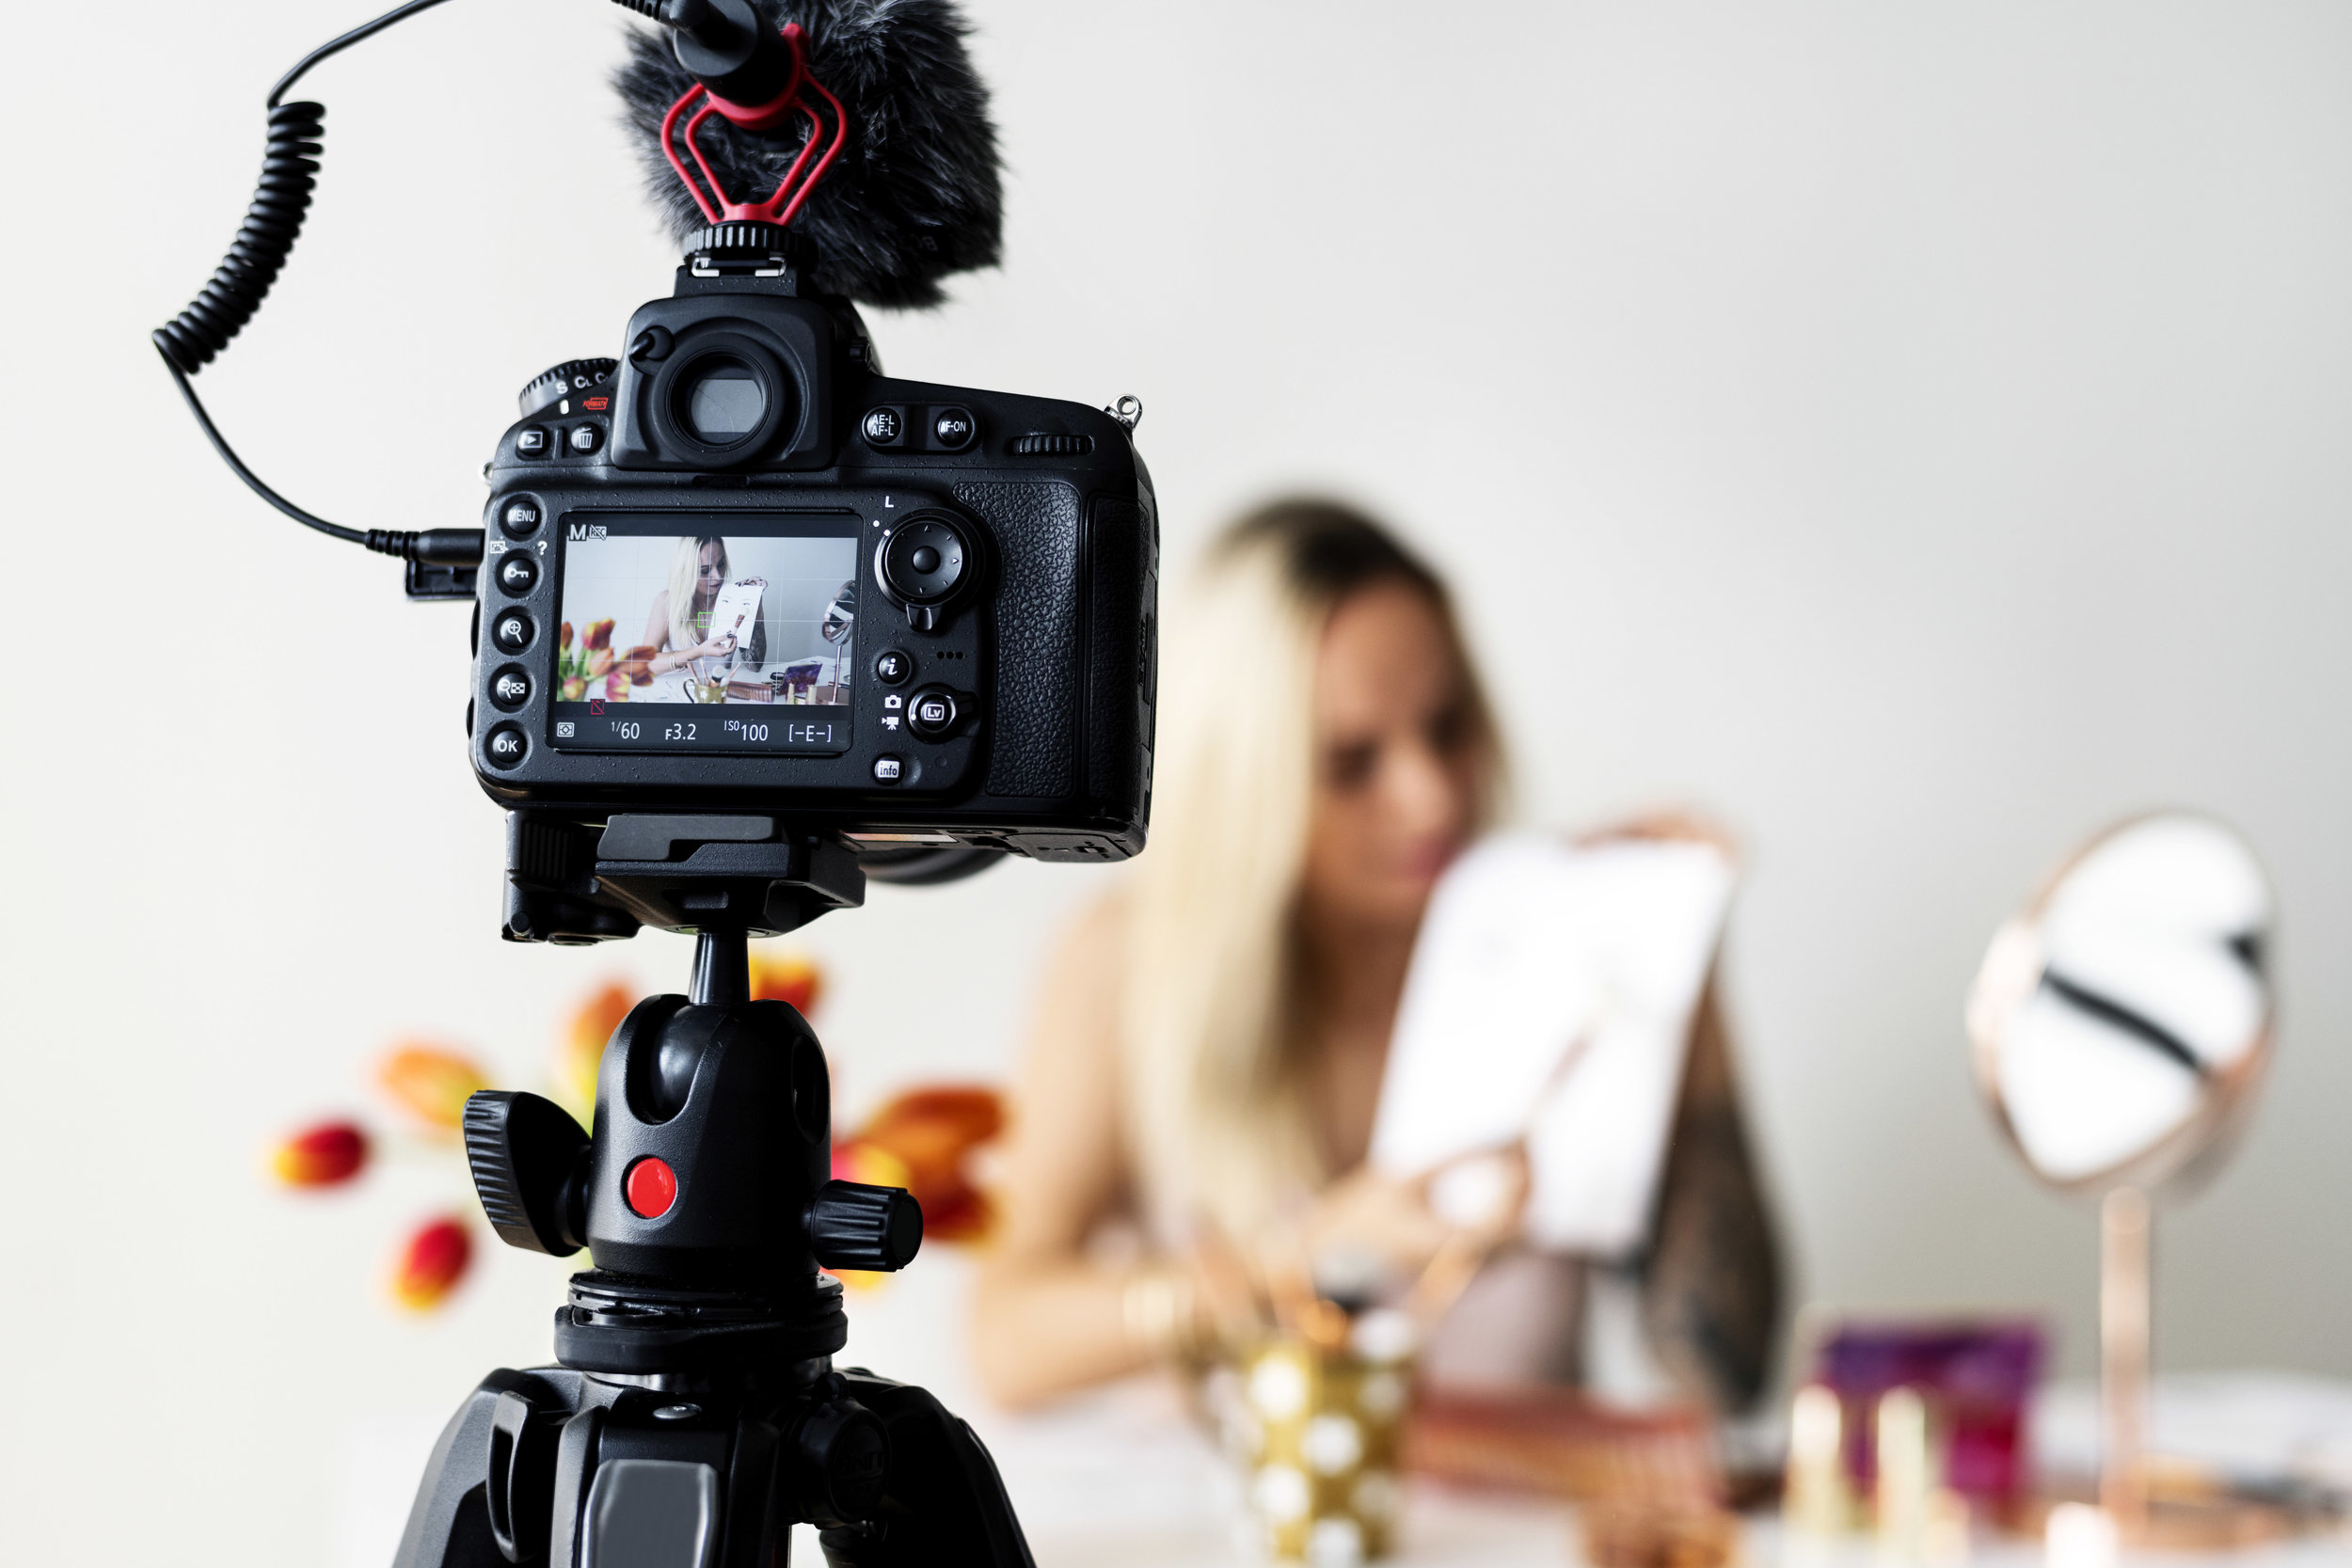 VIDEO - EDITING